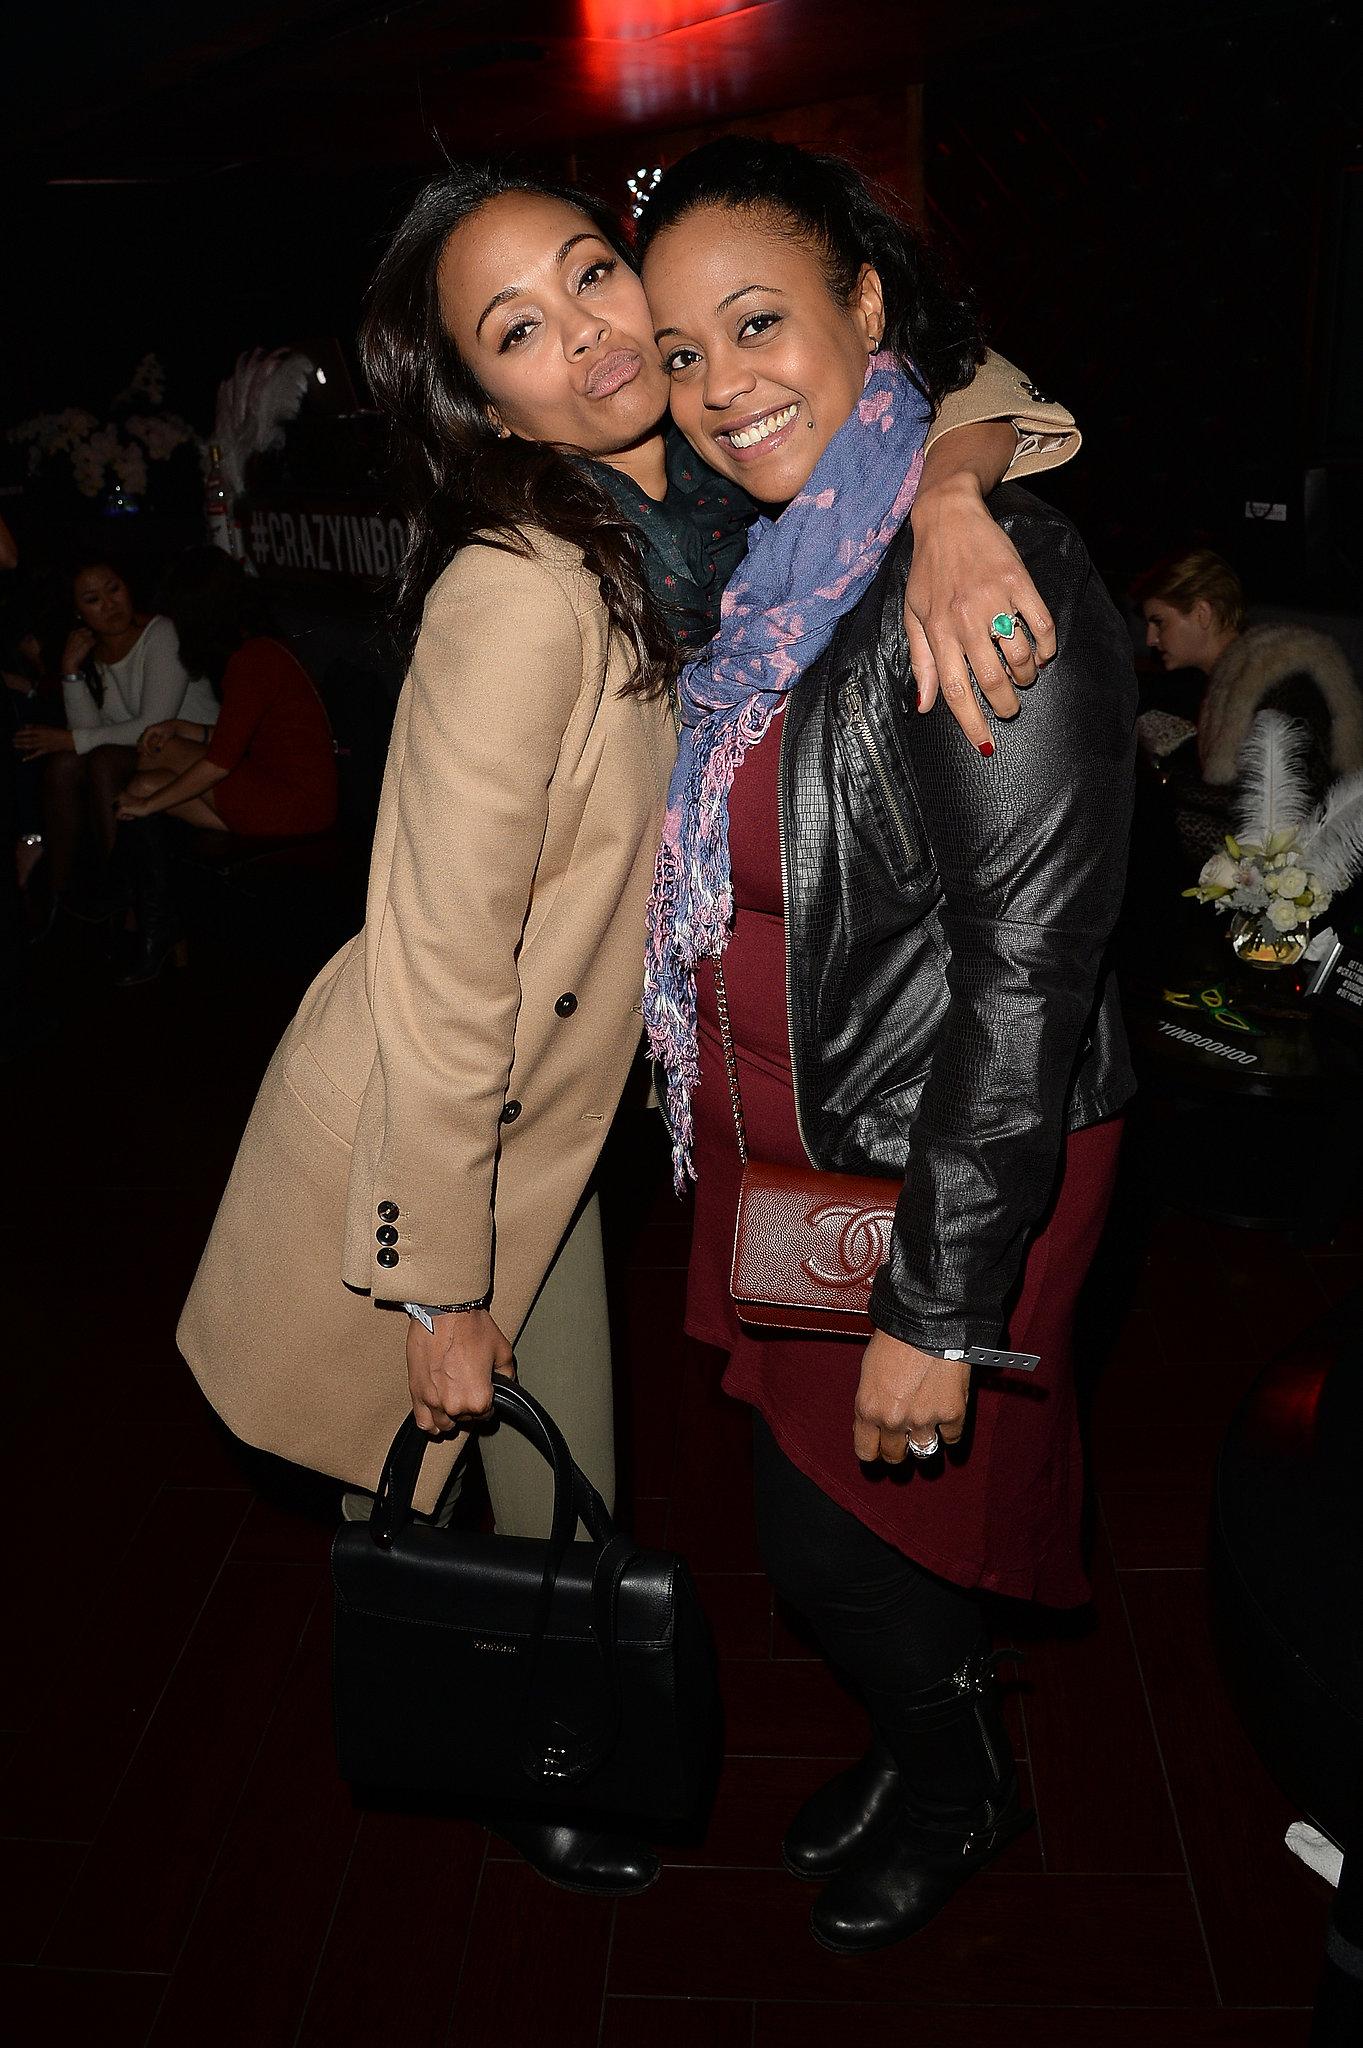 Zoe Saldana planted a kiss on her sister Mariel Saldana.